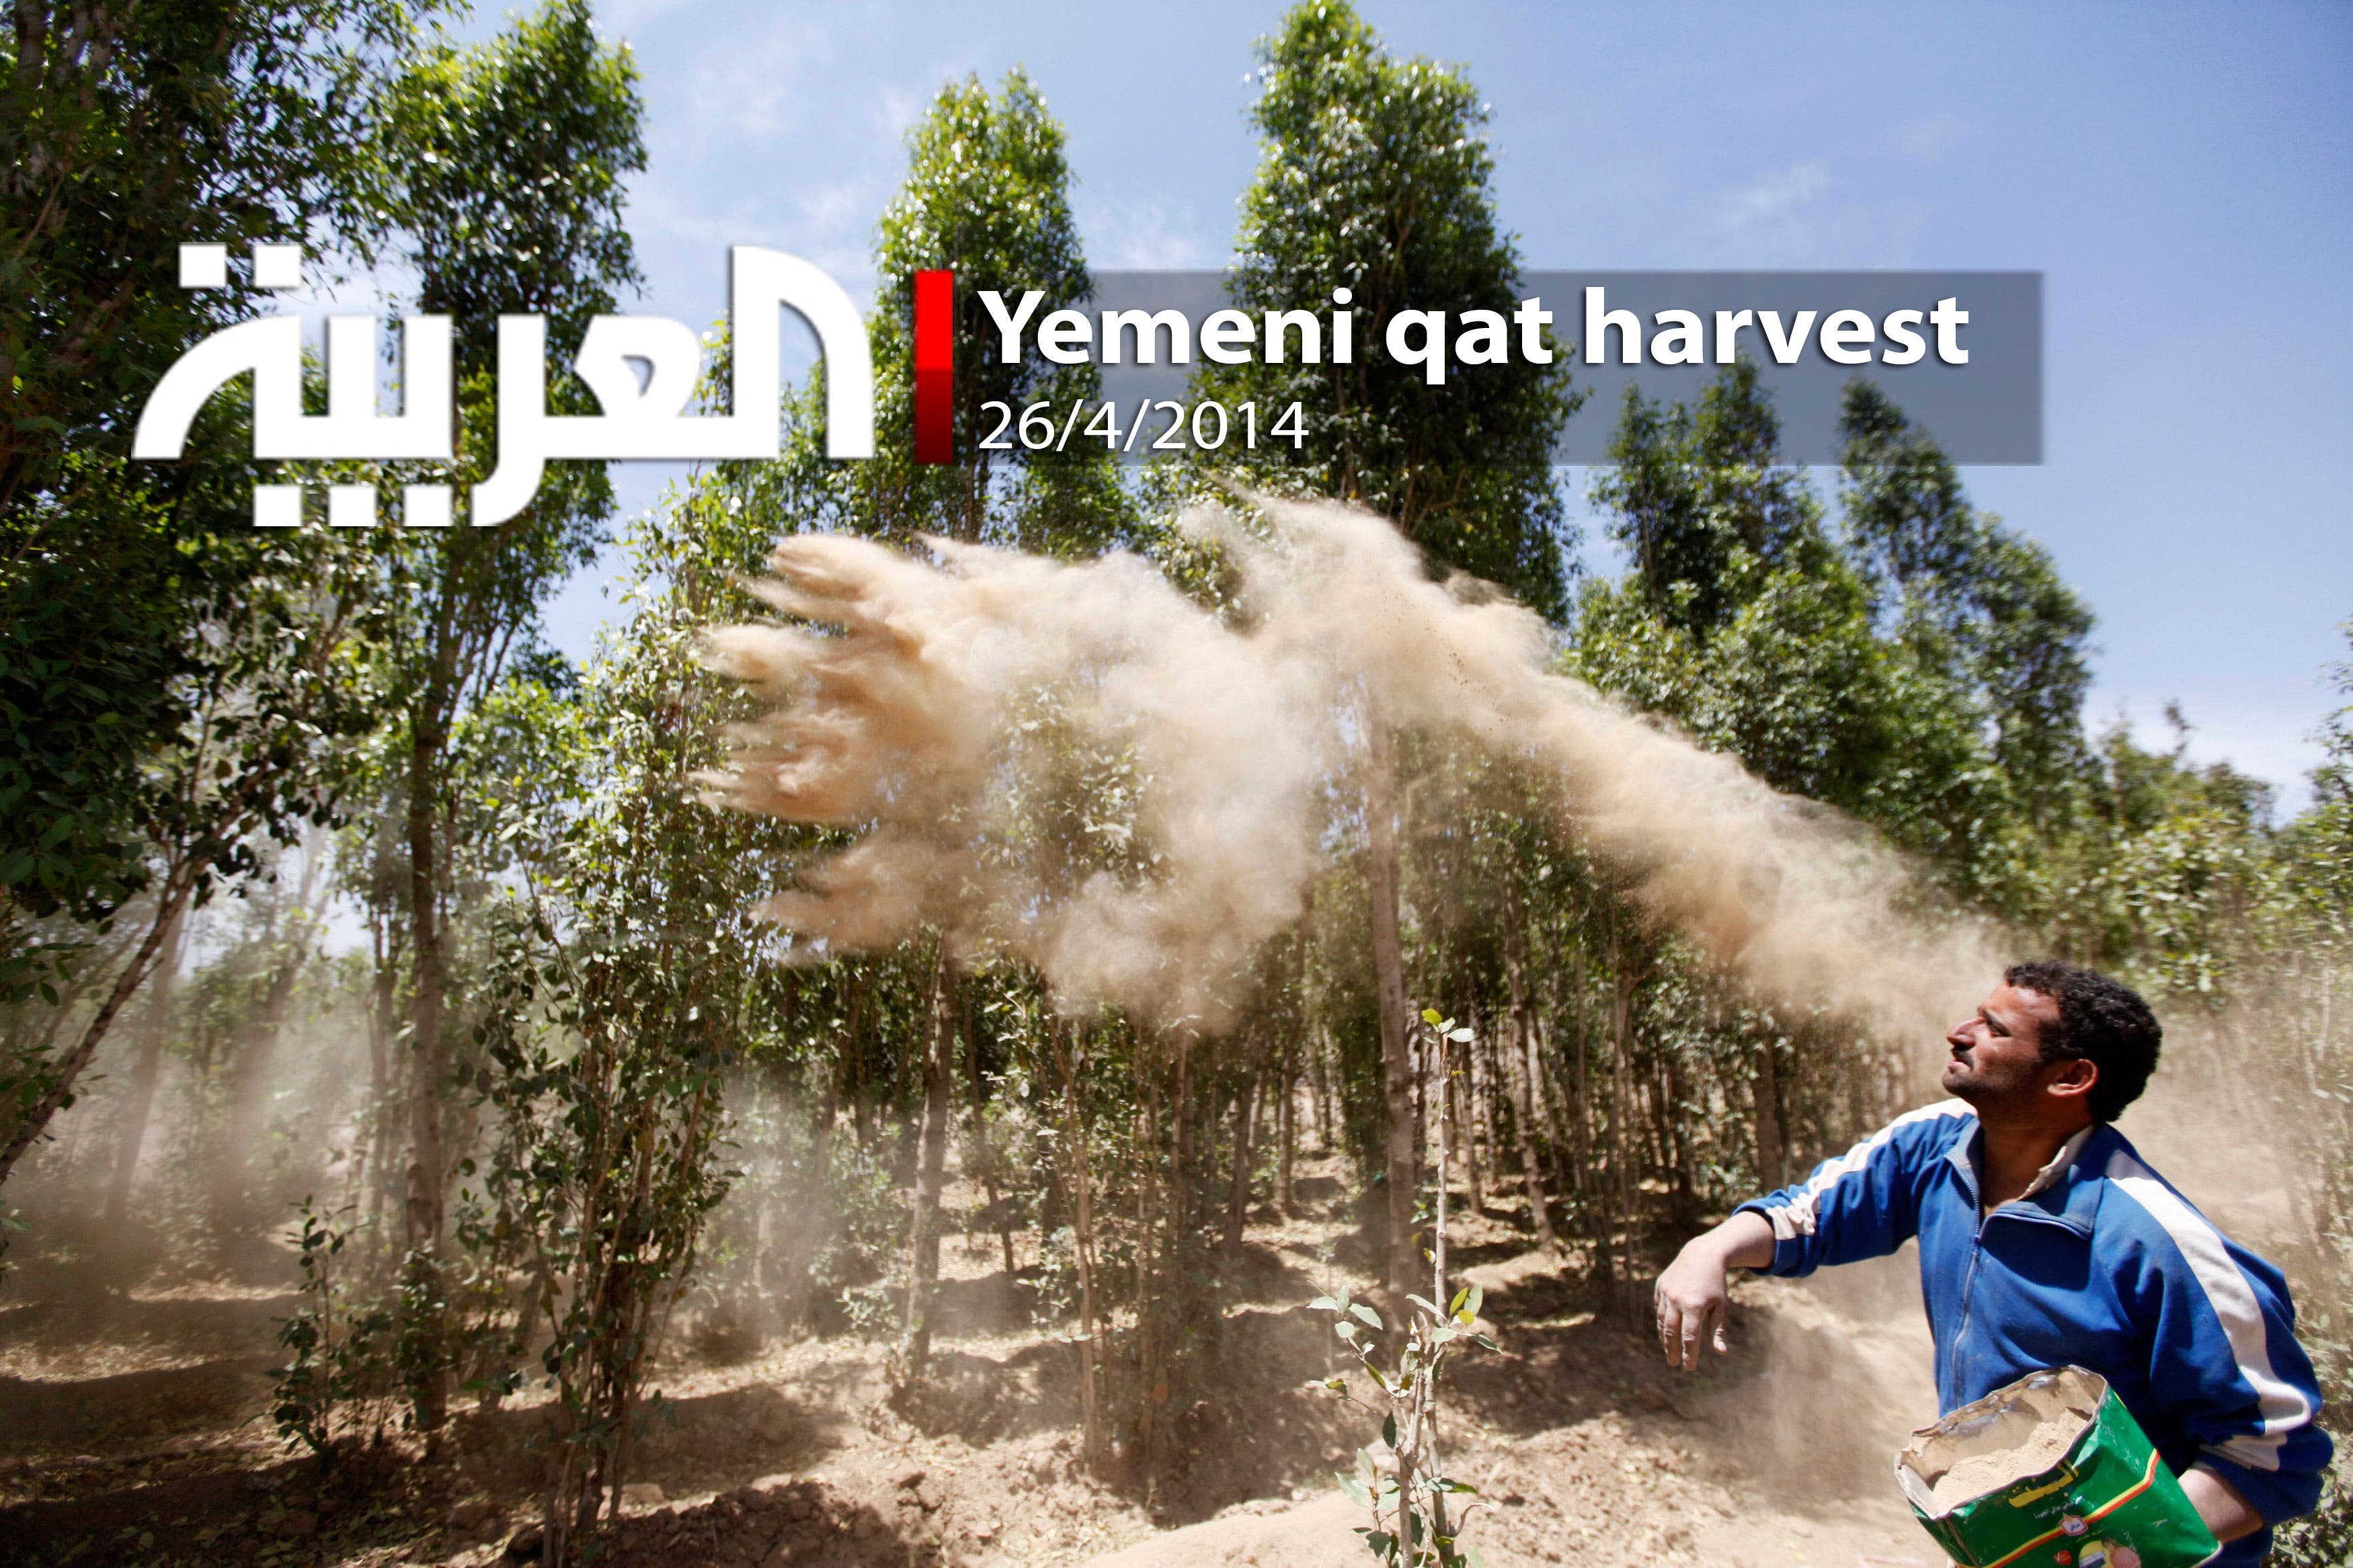 Yemeni qat harvest